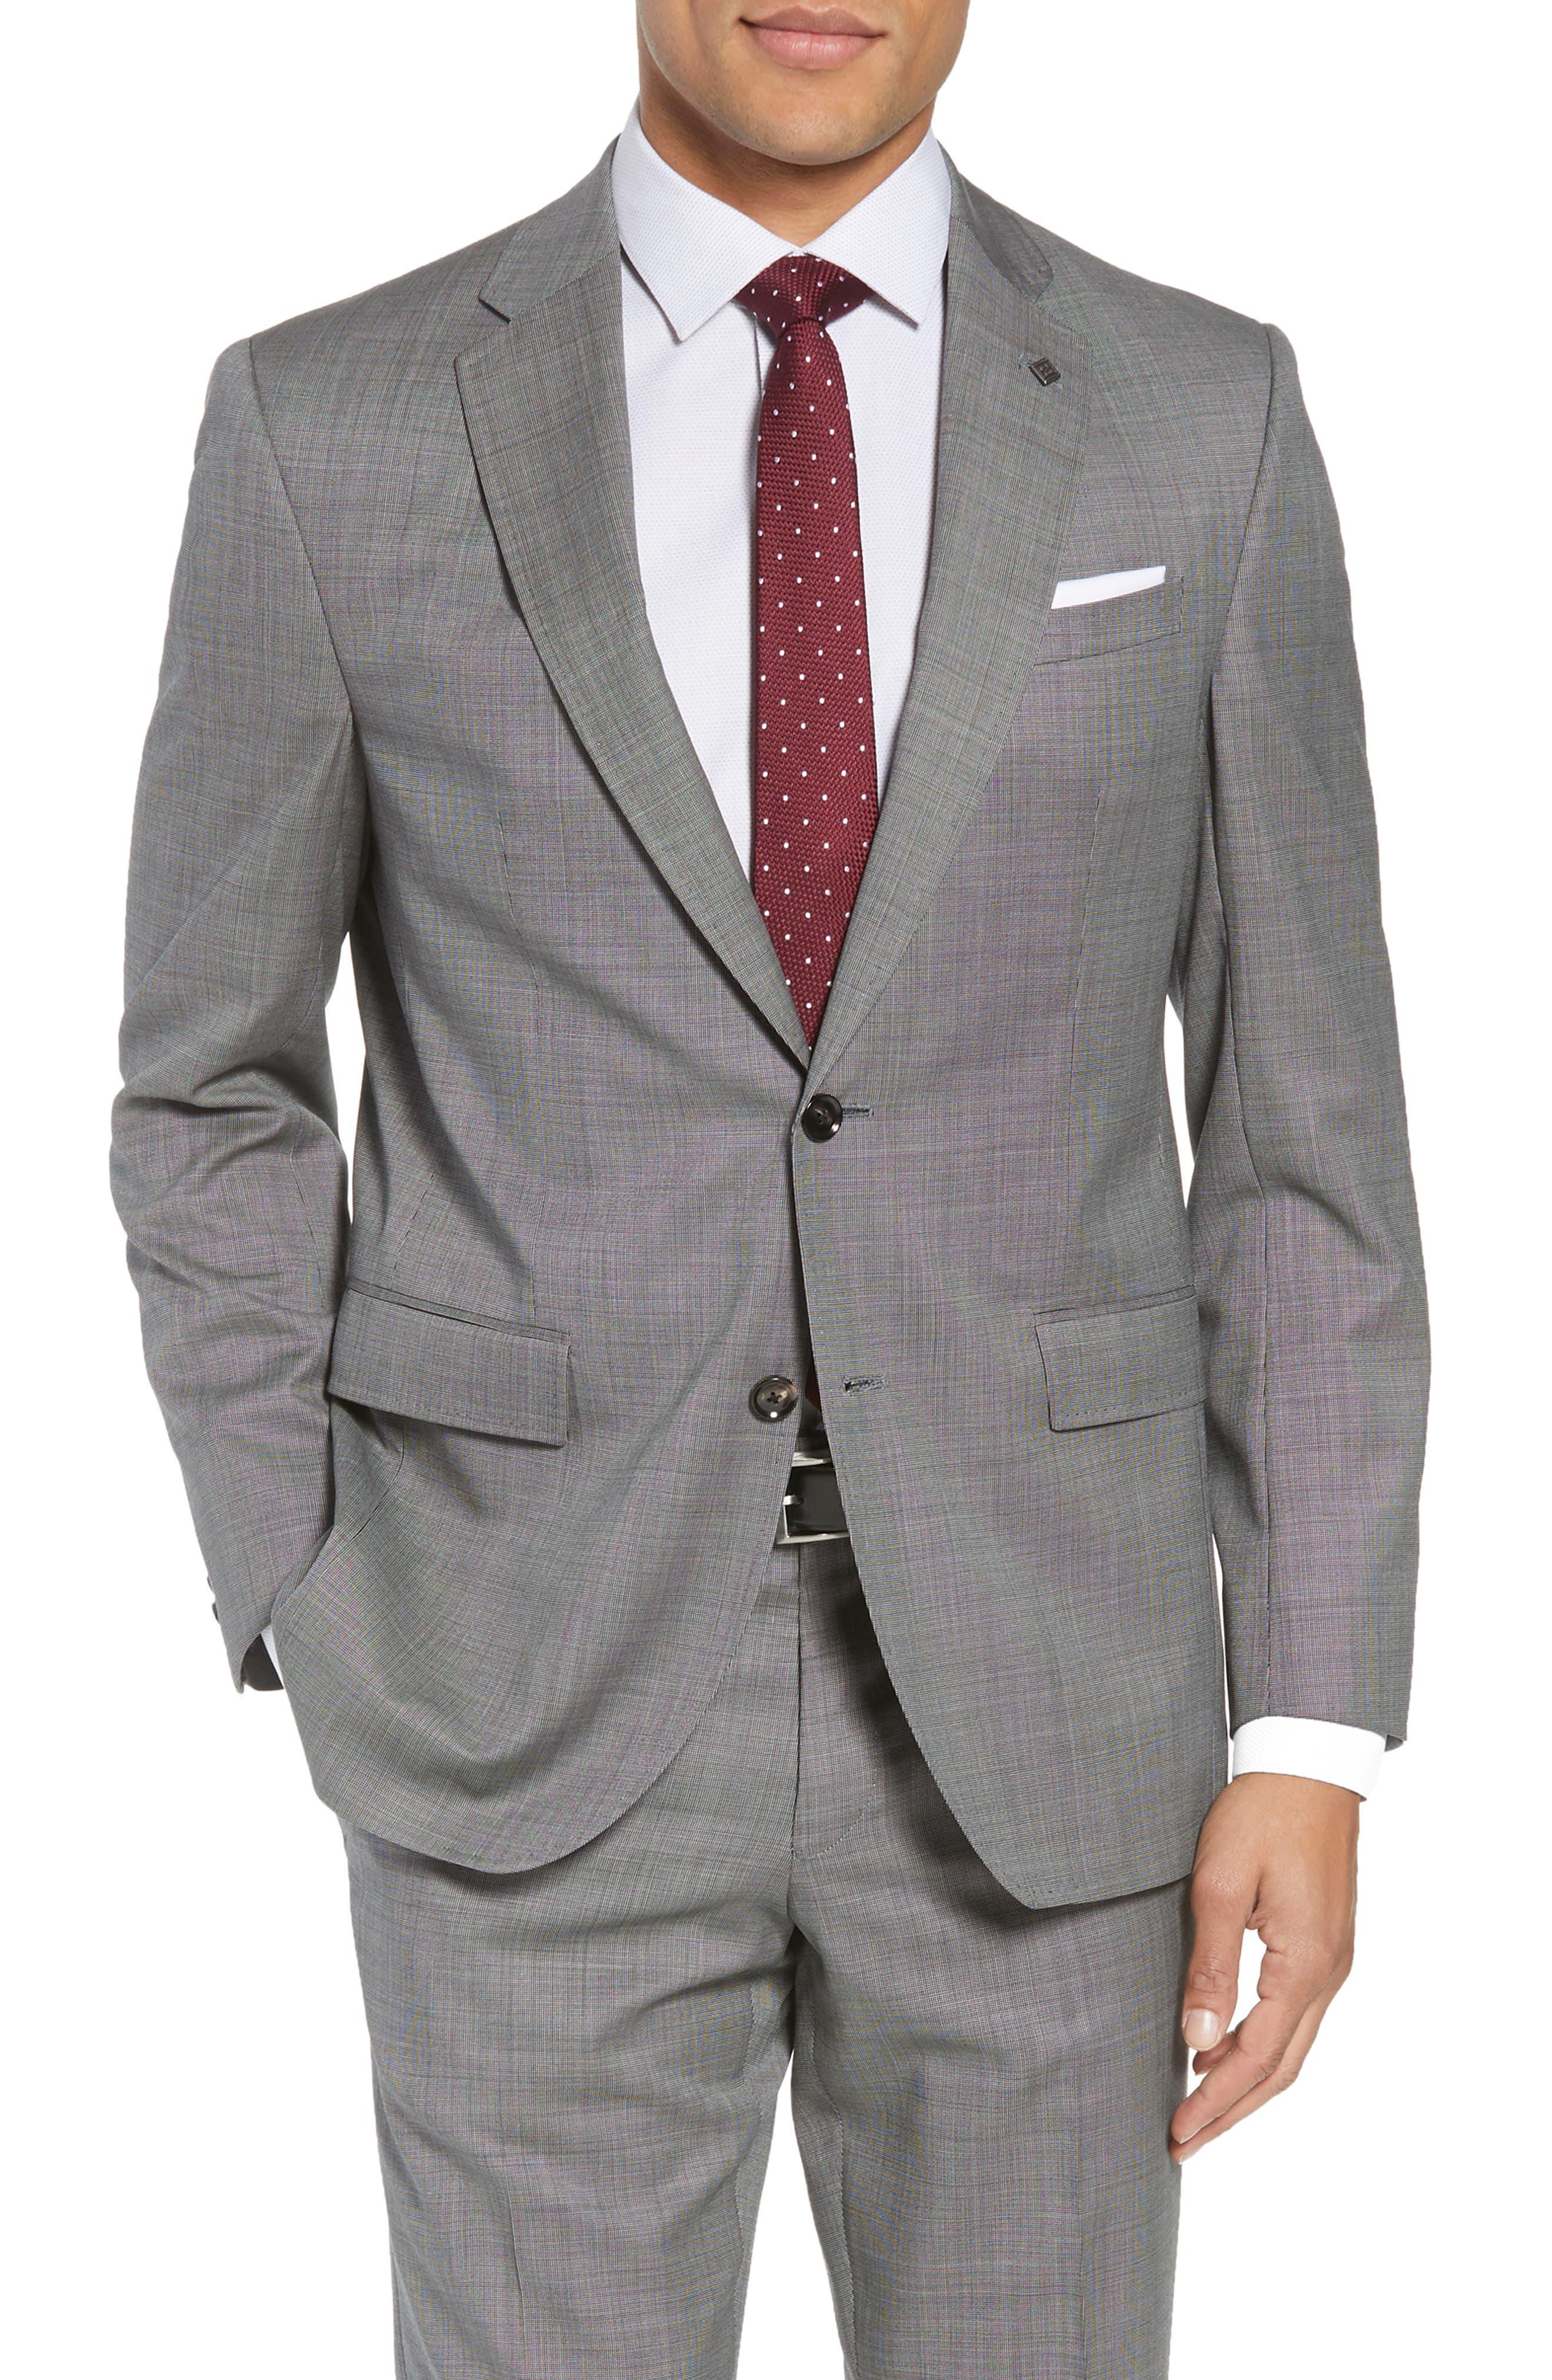 Jay Trim Fit Solid Wool Suit,                             Alternate thumbnail 9, color,                             LIGHT GREY